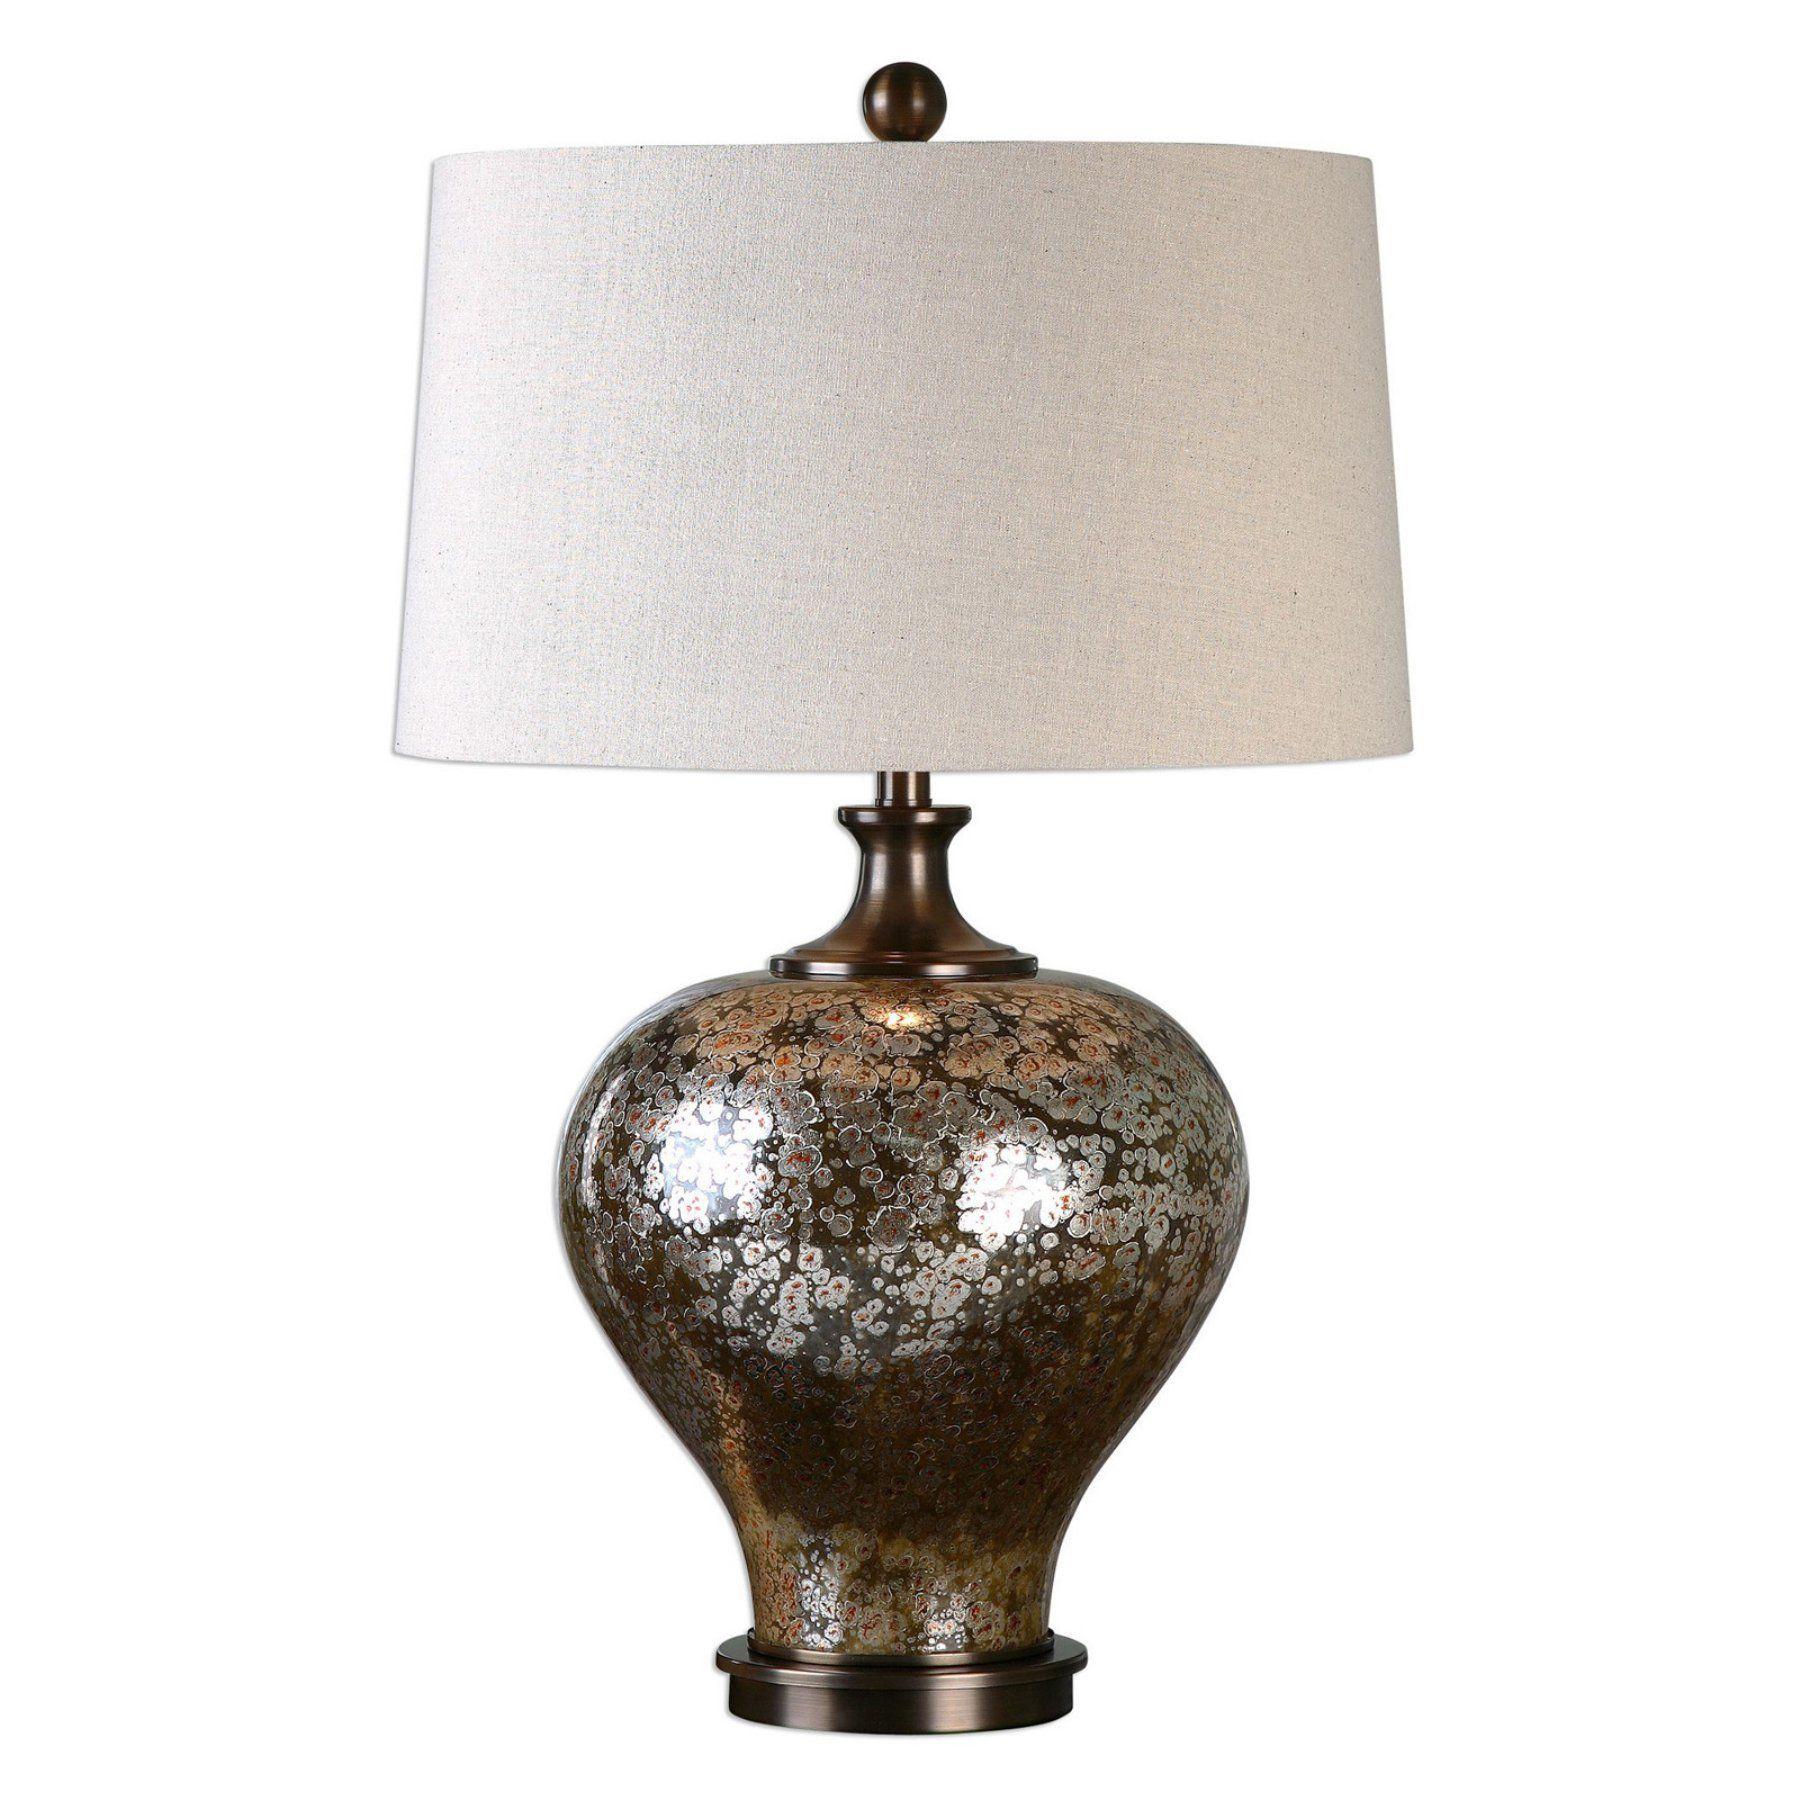 Uttermost Liro Table Lamp 271541 Mercury glass table